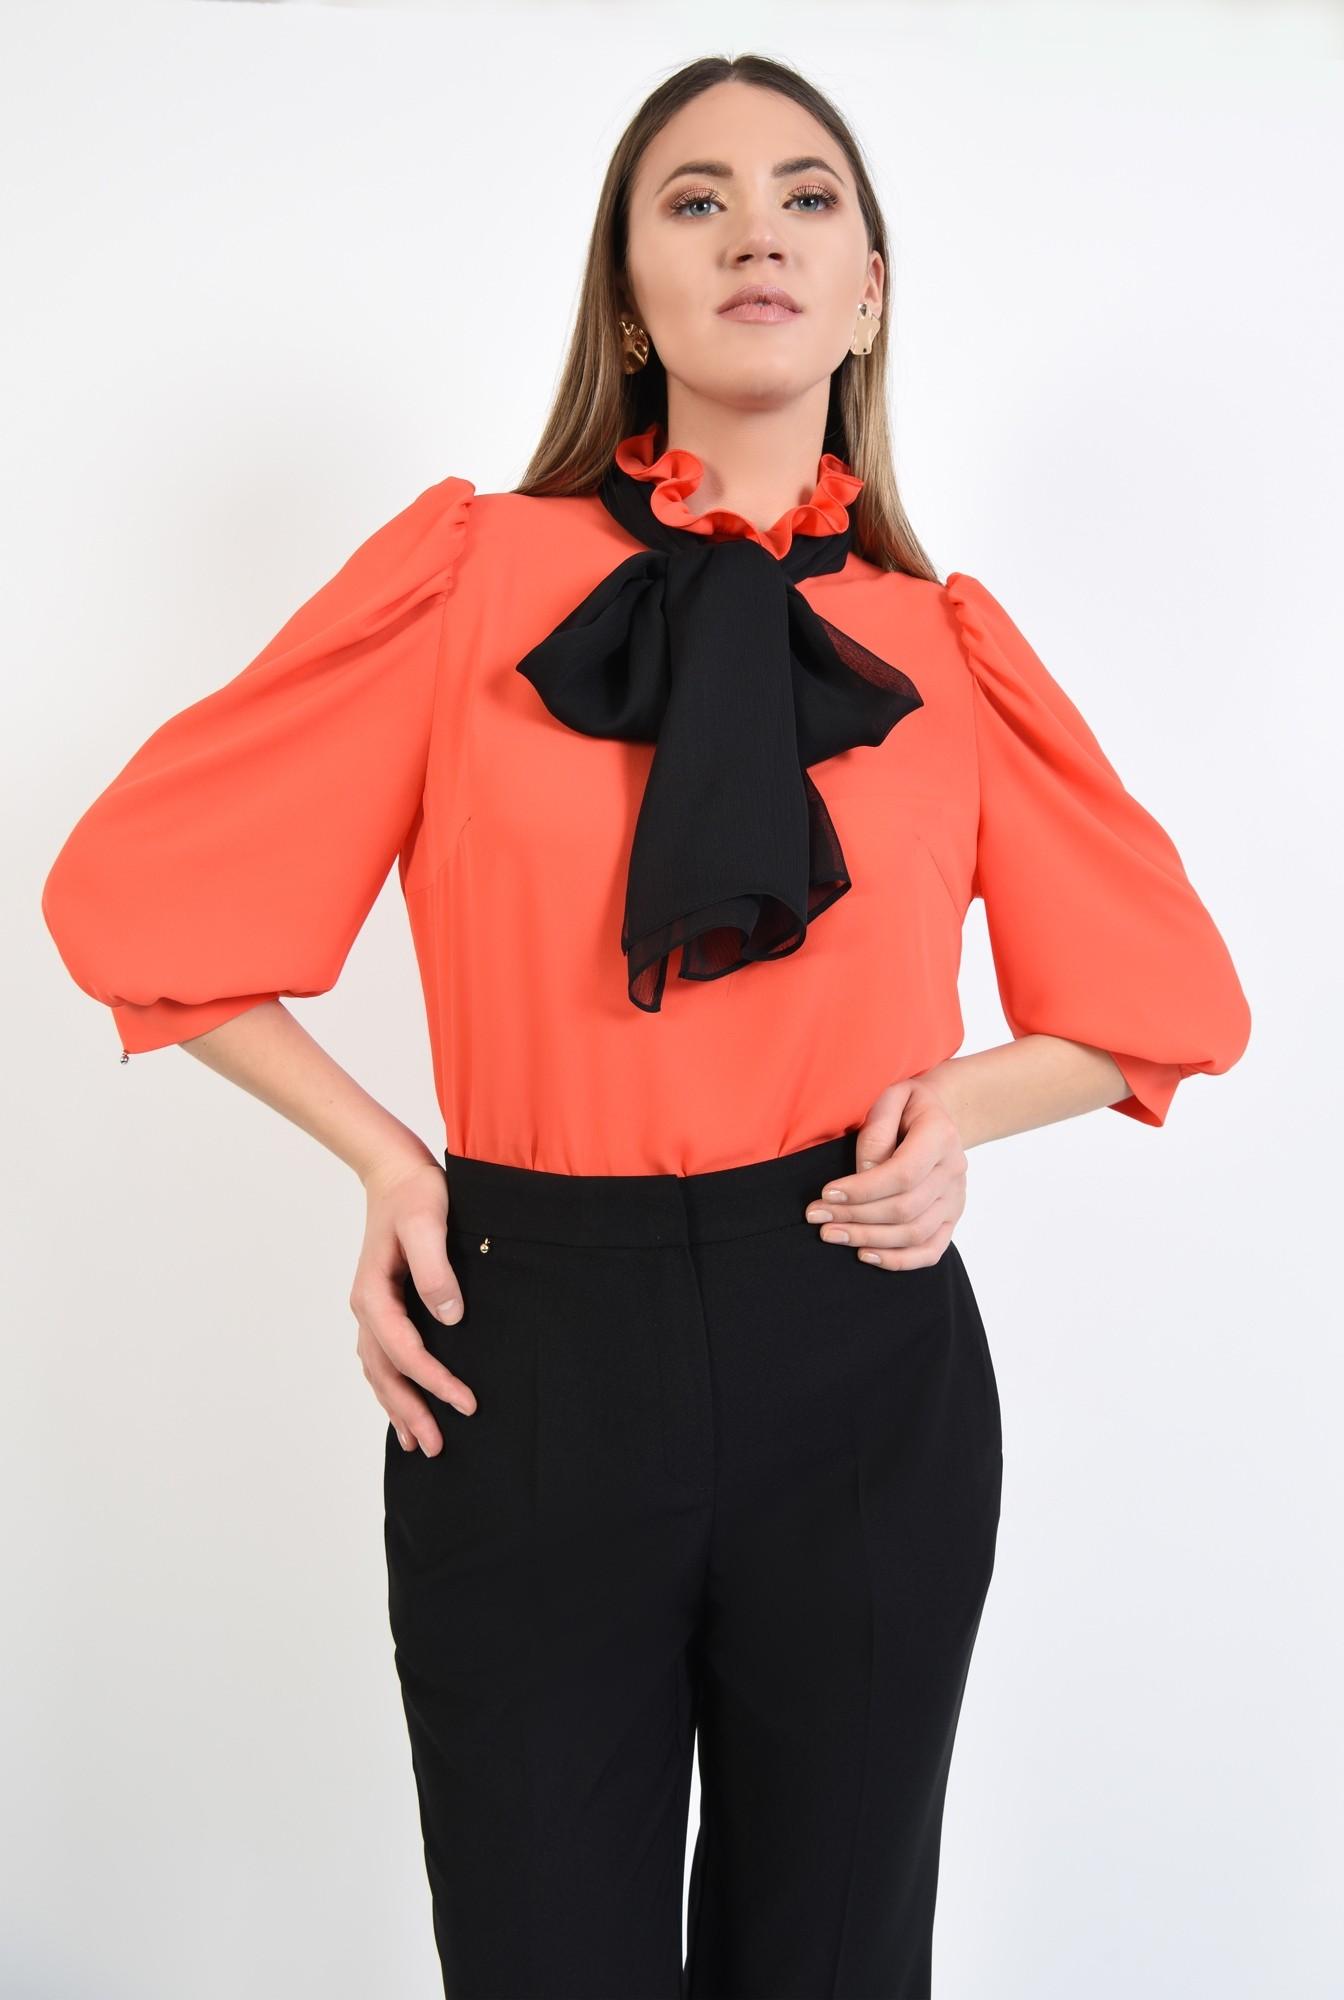 0 - 360 - bluza eleganta, maneci 3/4 cu mansete, funda neagra, bluza din sifon